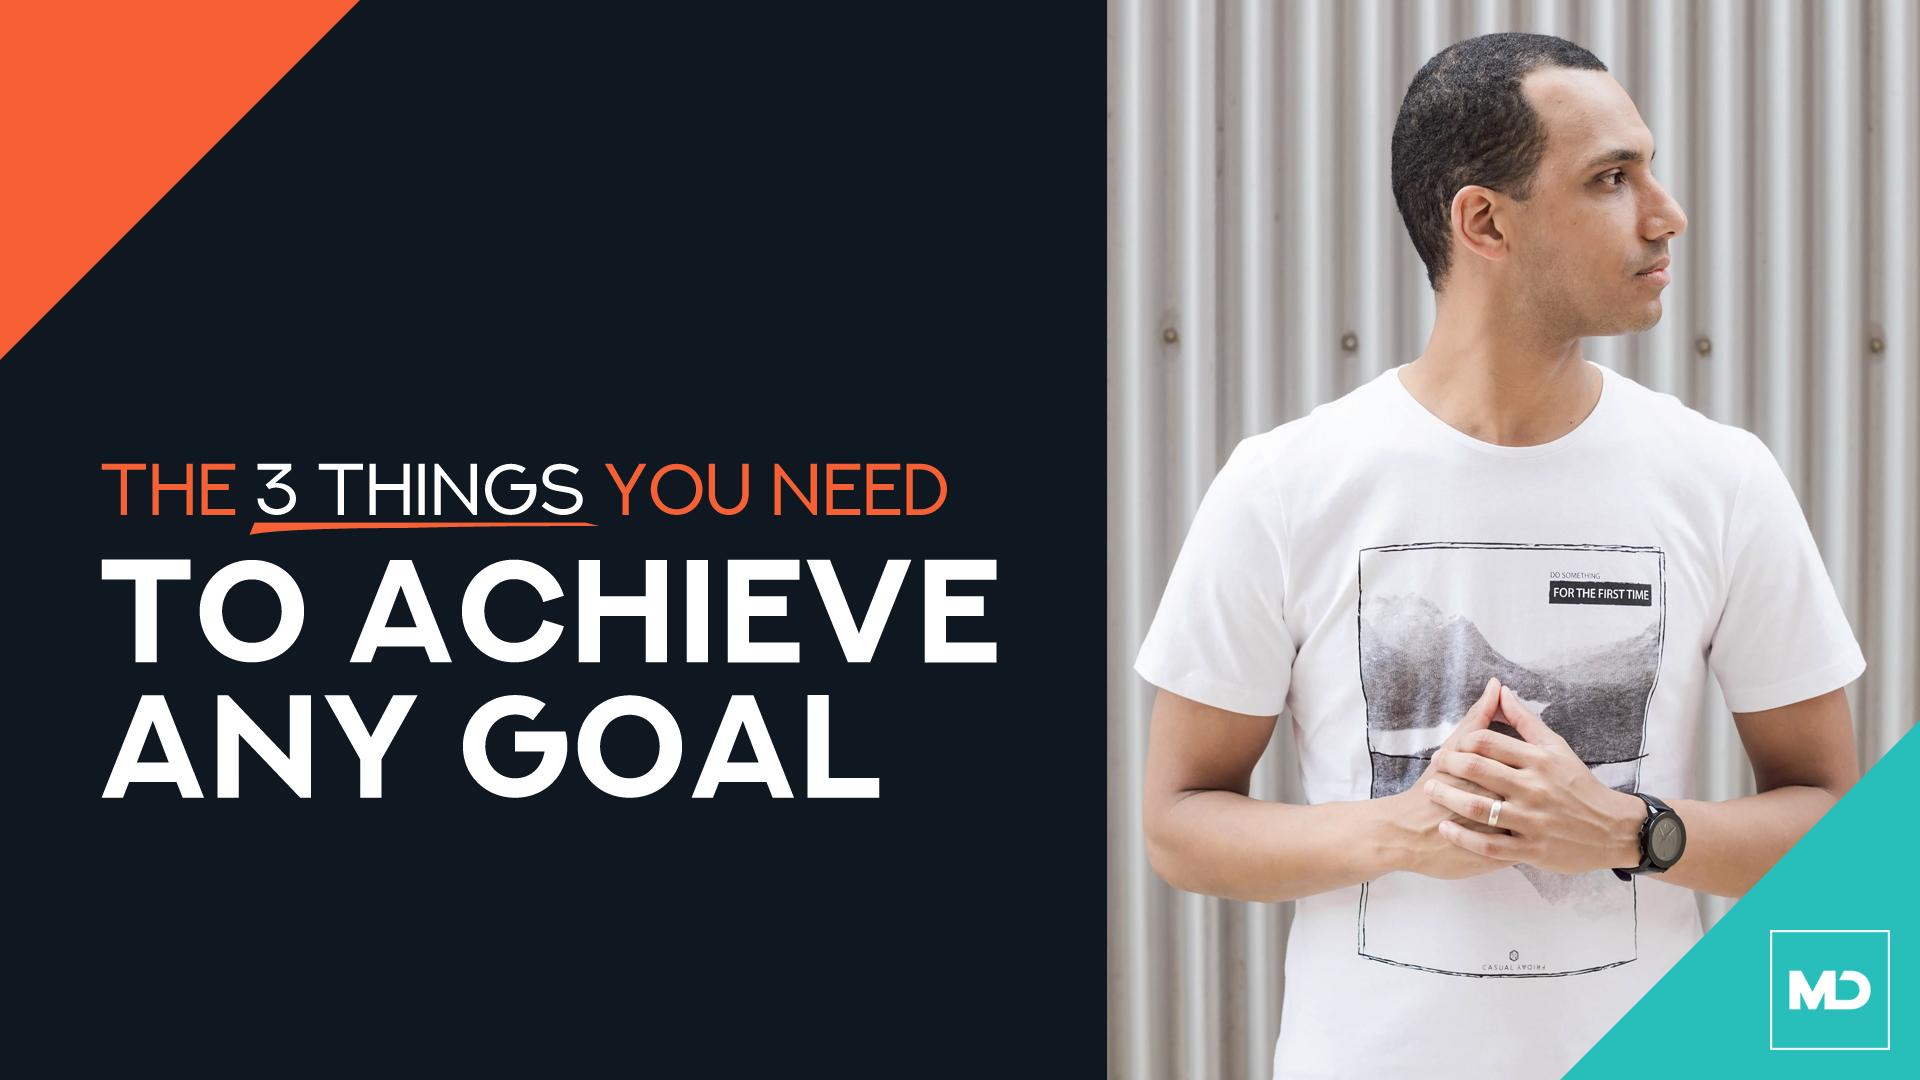 Toronto Entrepreneur Tips - 3 Things You Need to Achieve Any Goal